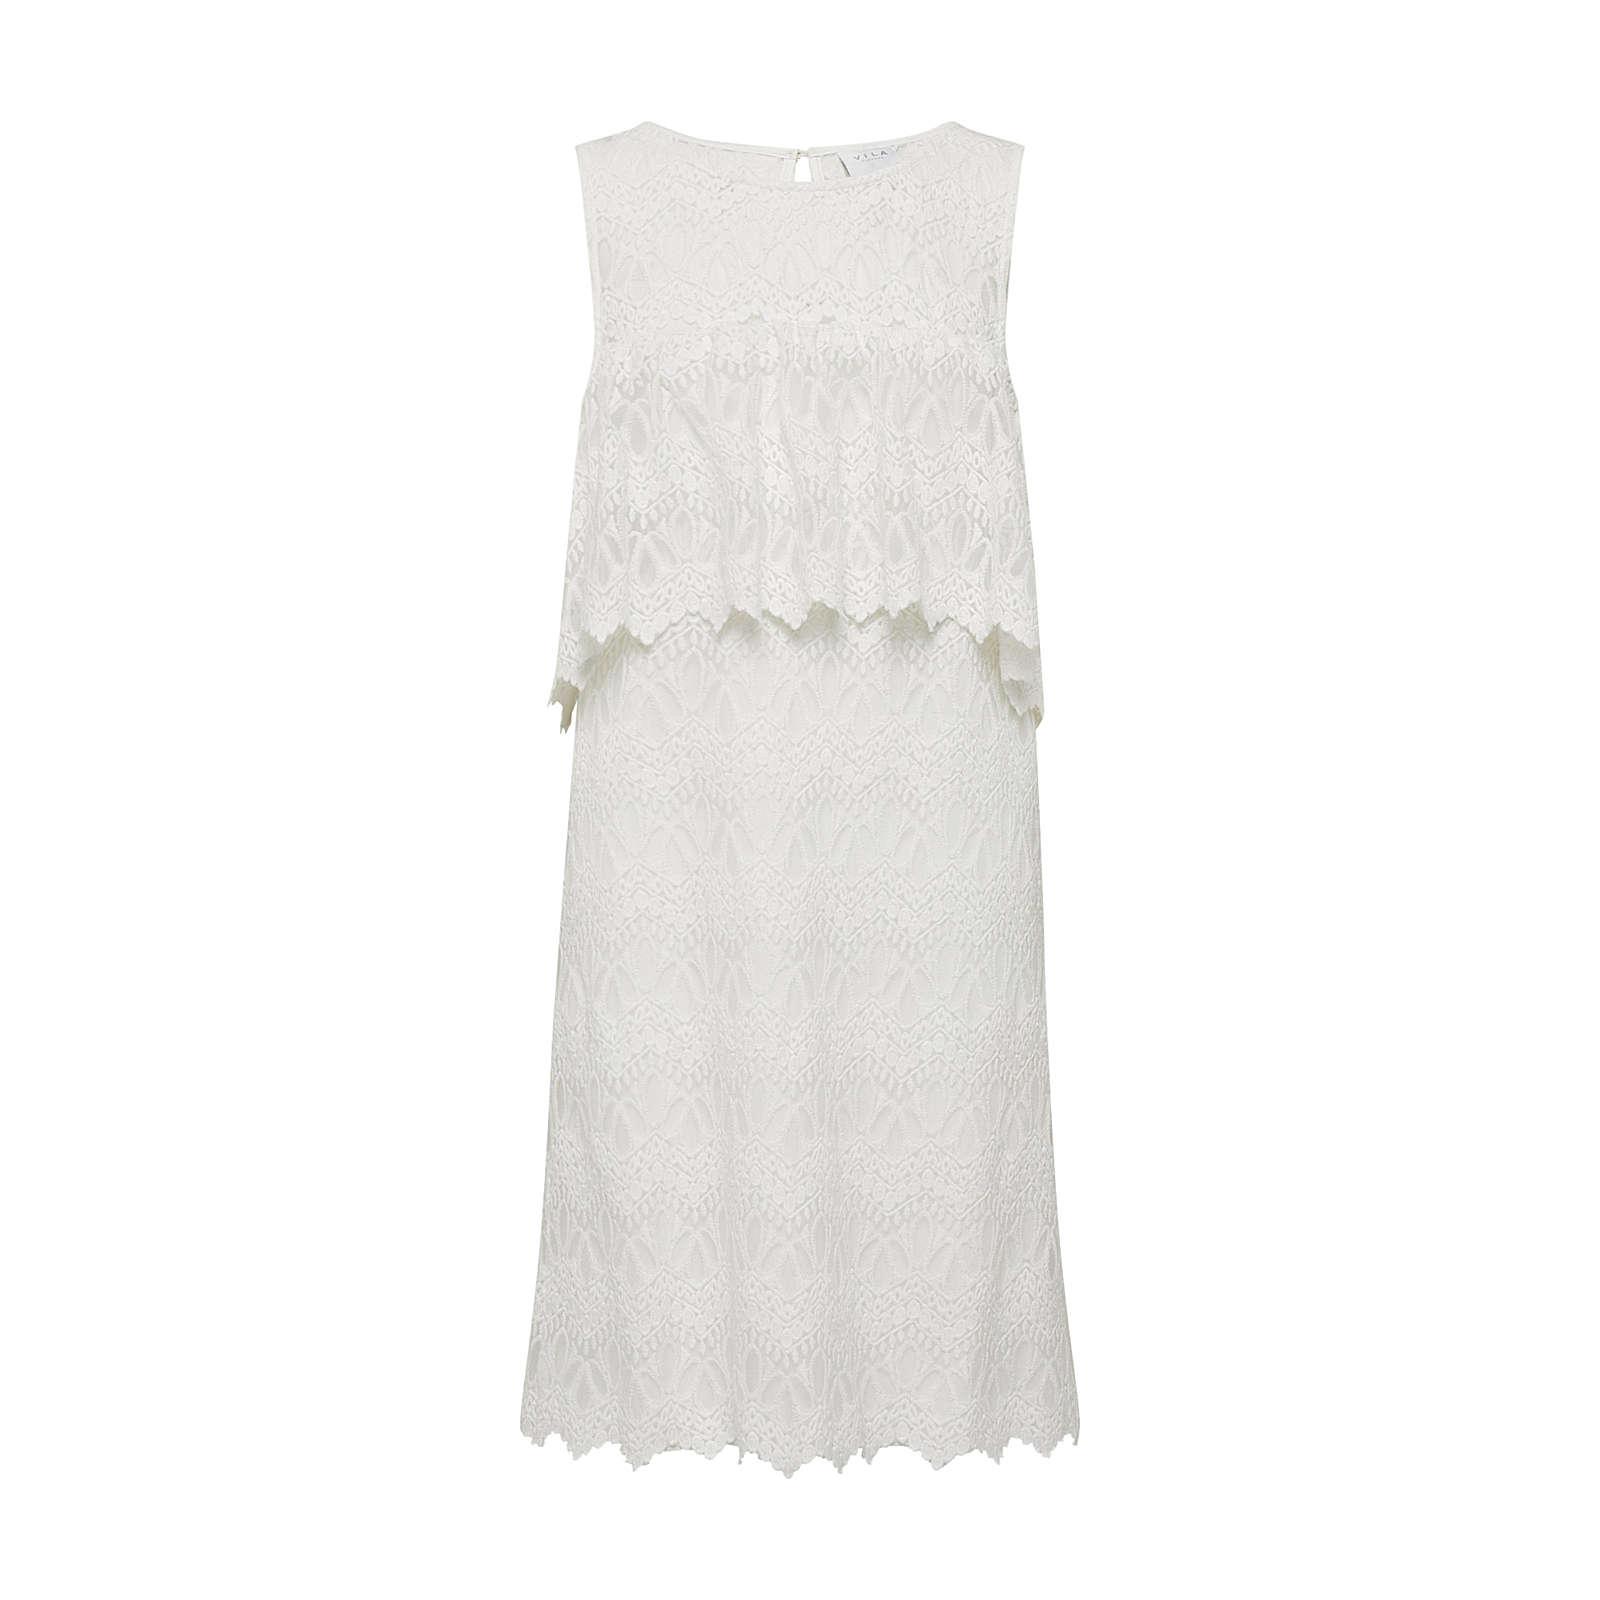 VILA Sommerkleid Sommerkleider weiß Damen Gr. 42